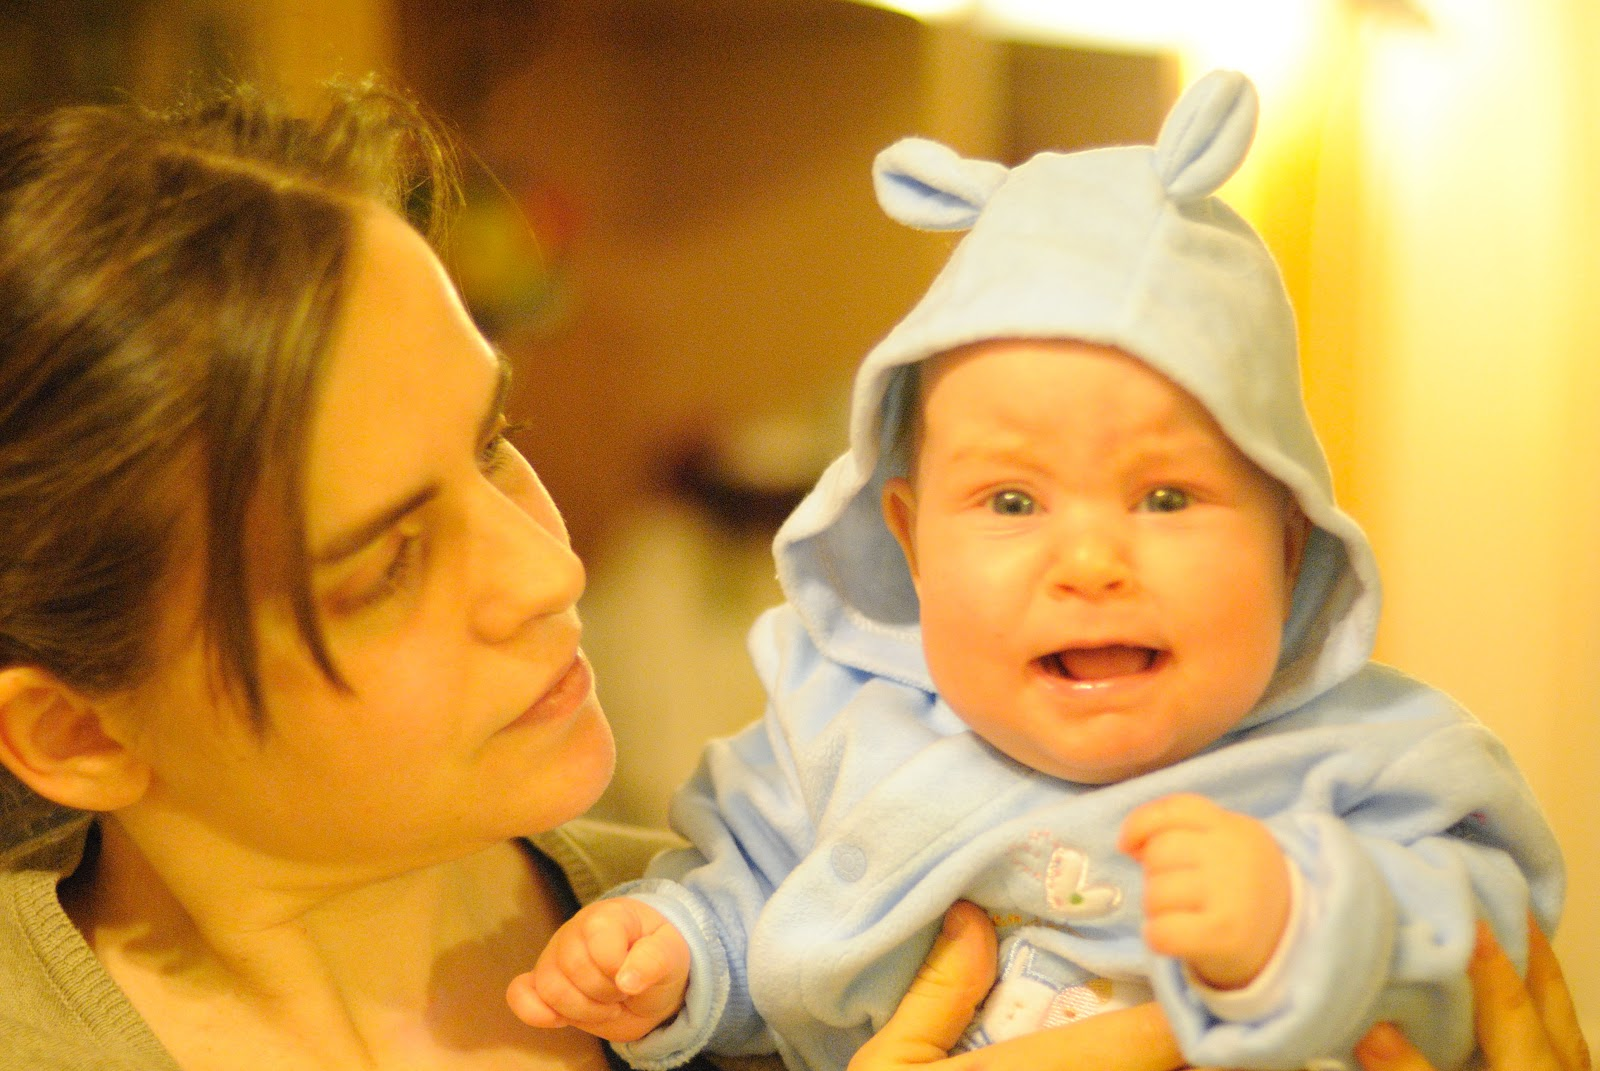 folla hija mientras duerme madre hijo espia madre fotografia a su hijo